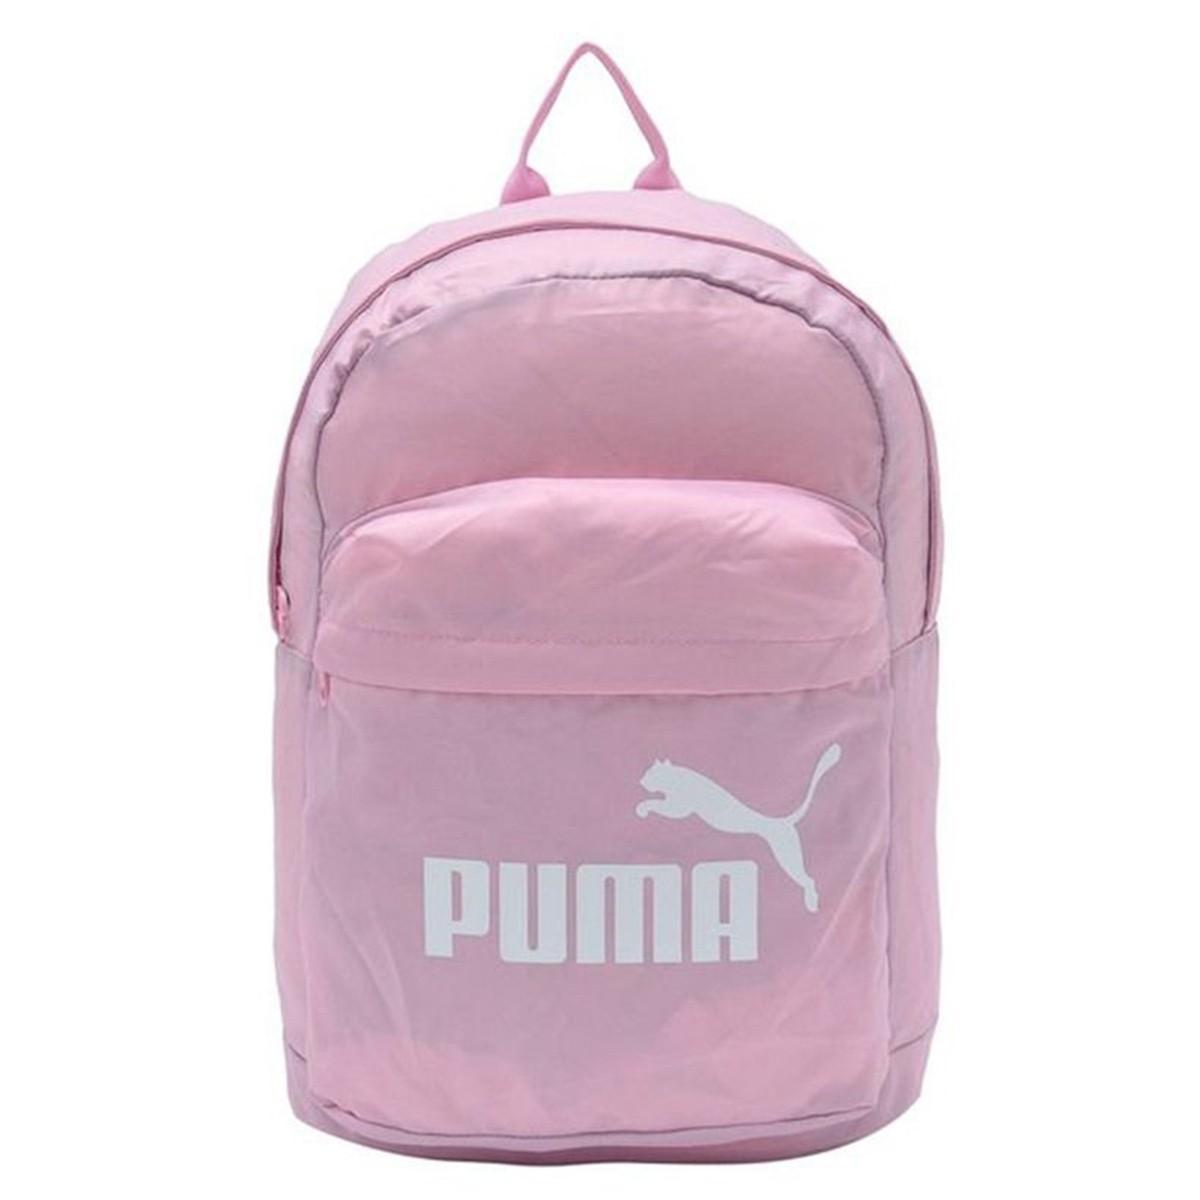 Mochila Puma Classic Backpack Feminino - Rosa